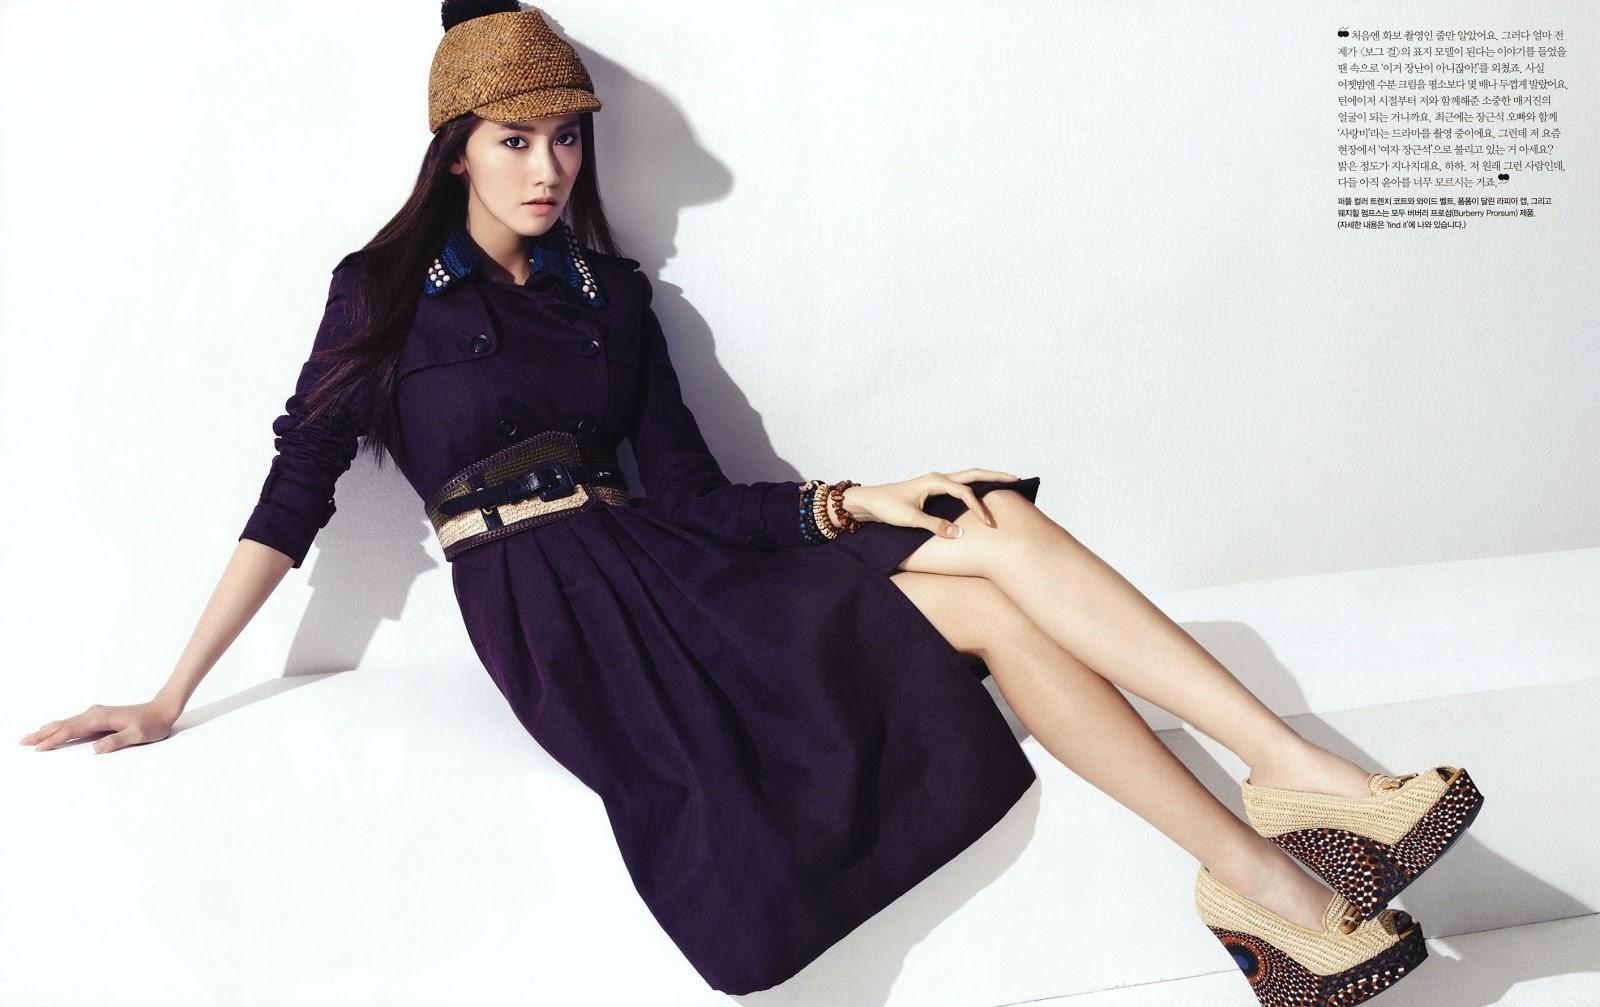 http://4.bp.blogspot.com/-FM6p29RTAJY/UO6lKWwW1MI/AAAAAAAAXPM/opx_SAcAqv4/s1600/SNSD+Yoona+Vogue+Girl+Wallpaper+HD.jpg